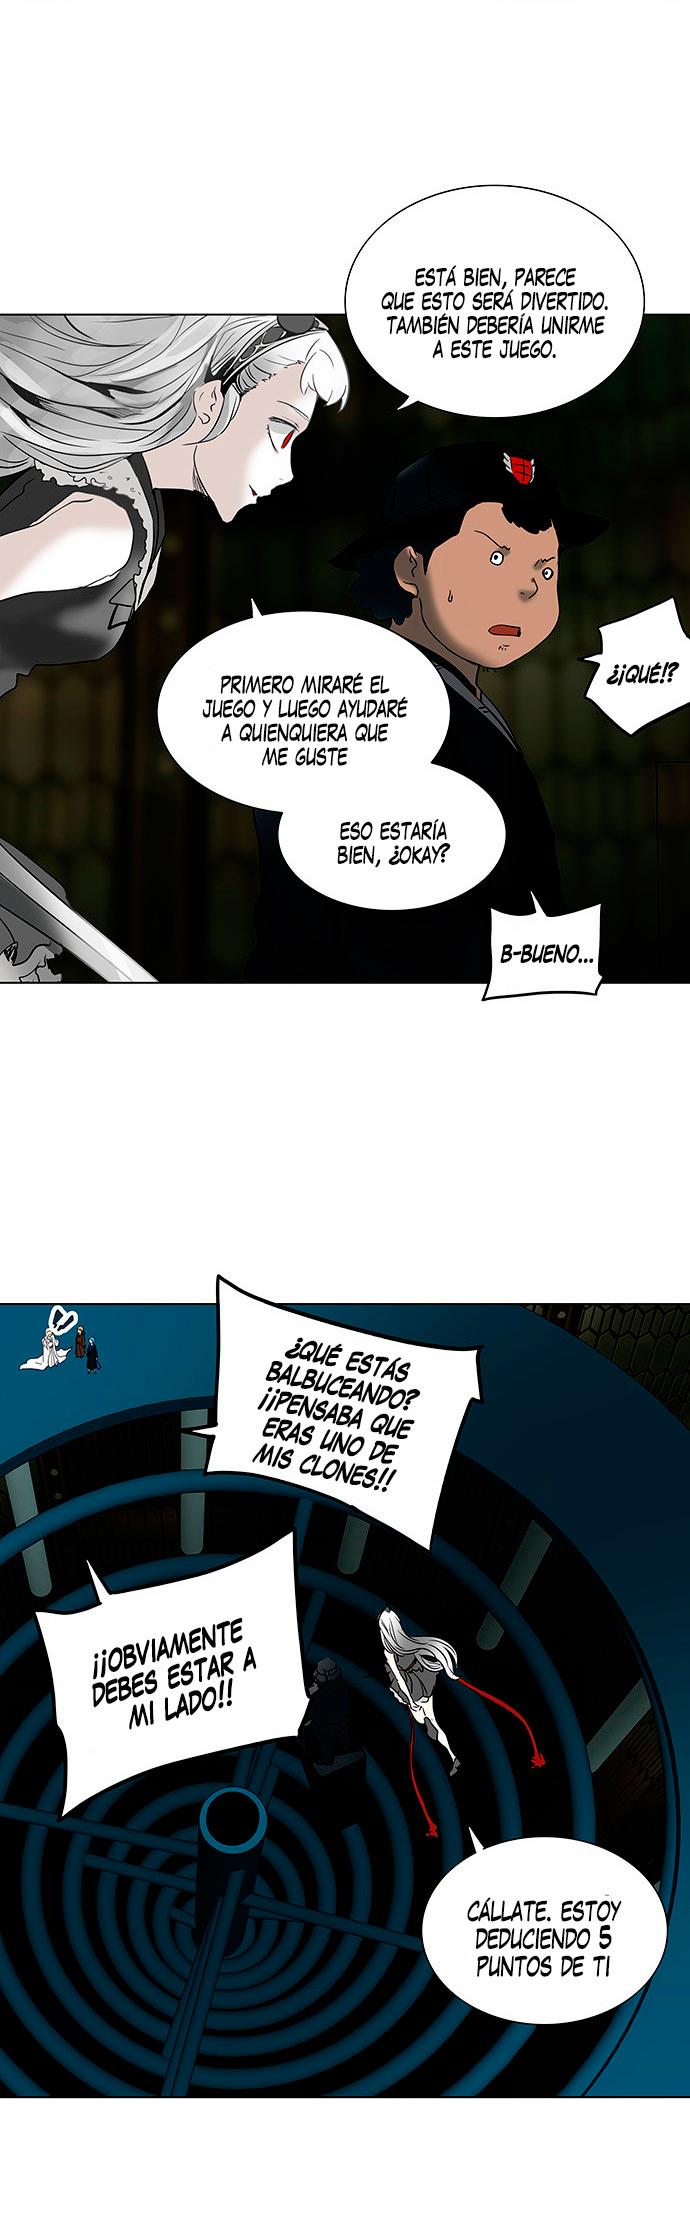 http://c5.ninemanga.com/es_manga/21/149/442229/26b527959eef19fec970d9a099bb4d50.jpg Page 9